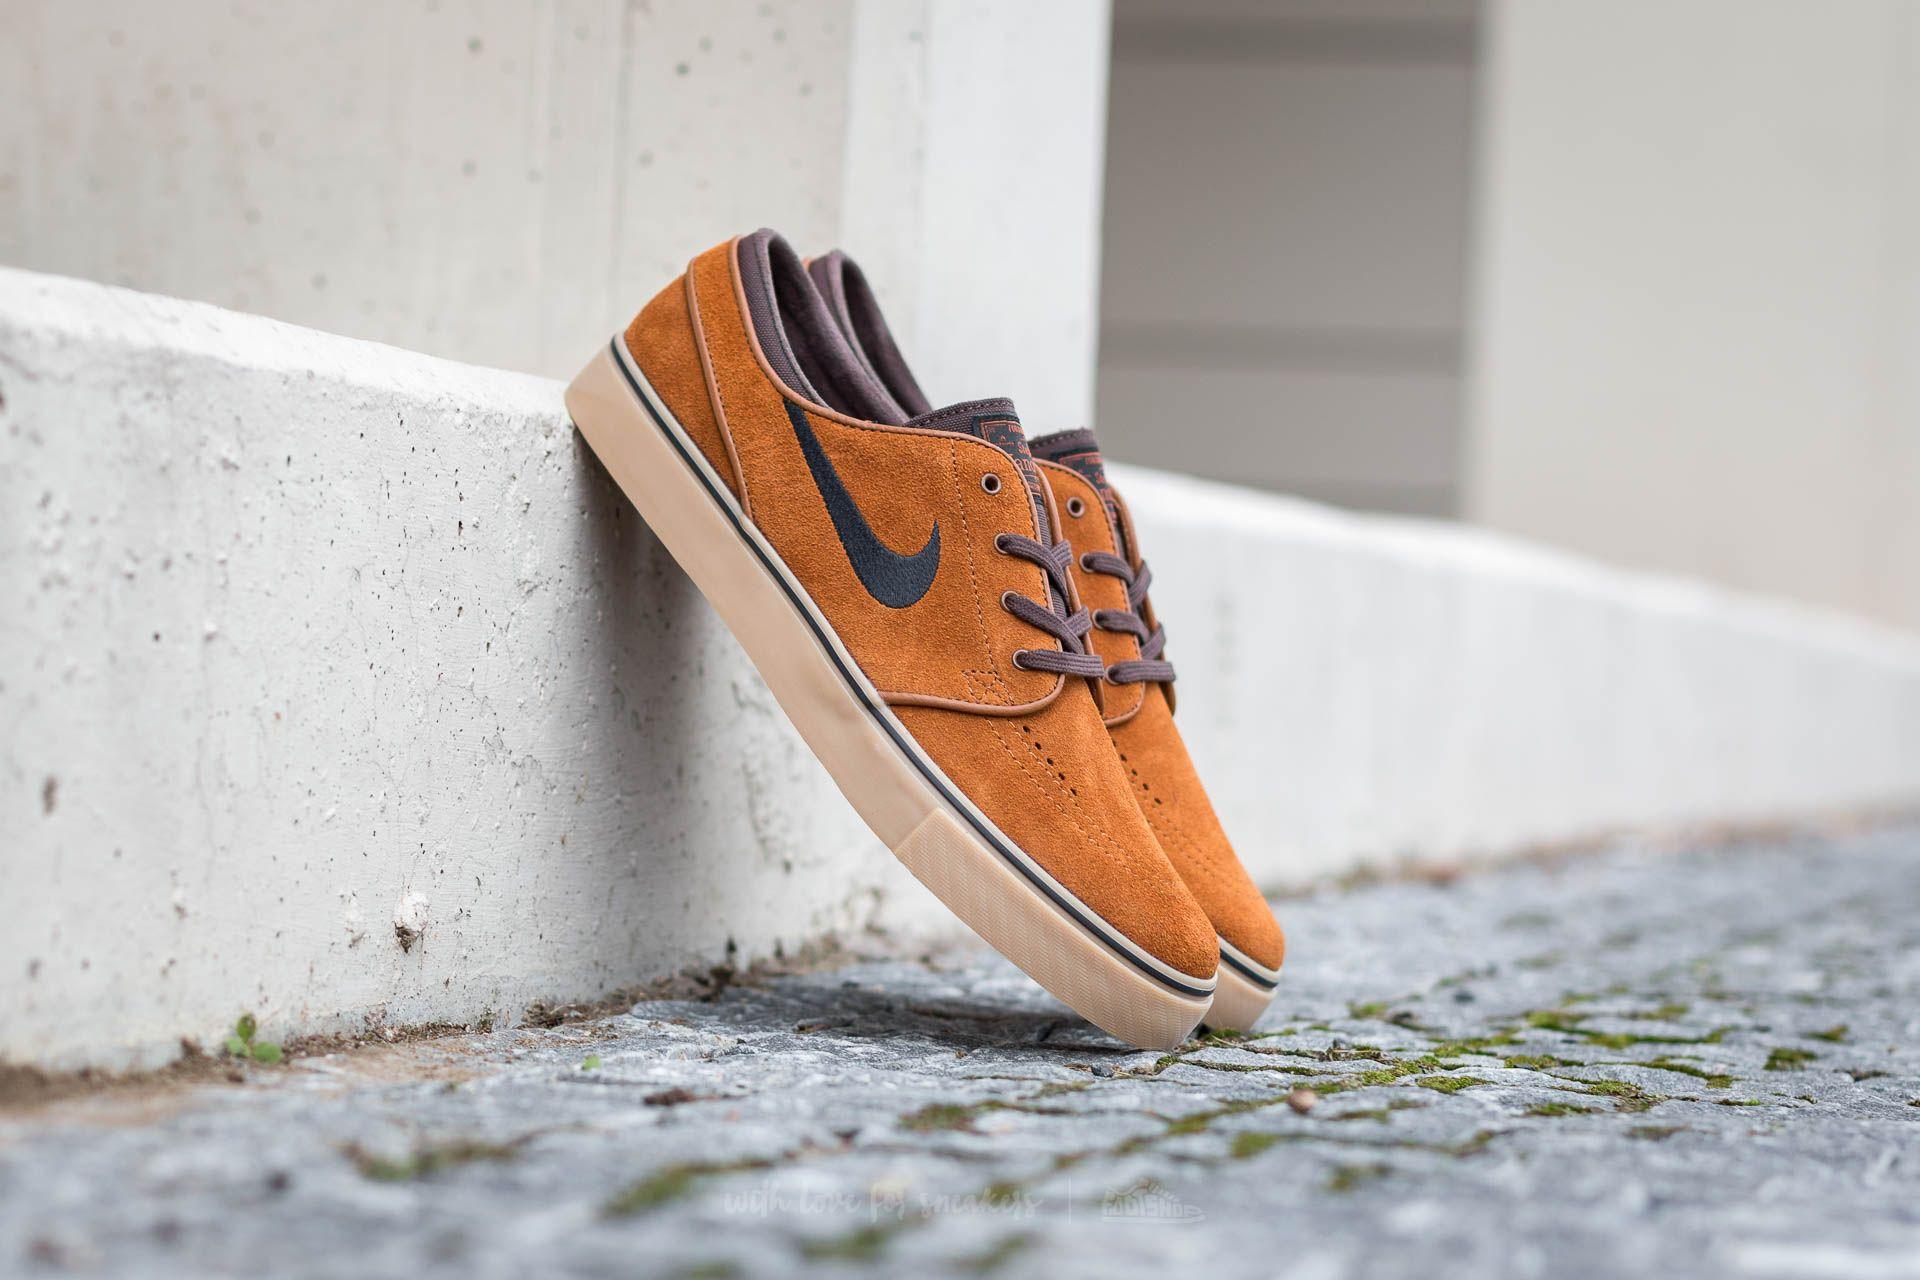 la nieve Educación Colonos  Men's shoes Nike Zoom Stefan Janoski Hazelnut/ Black-Baroque Brown-Gum  Light Brown